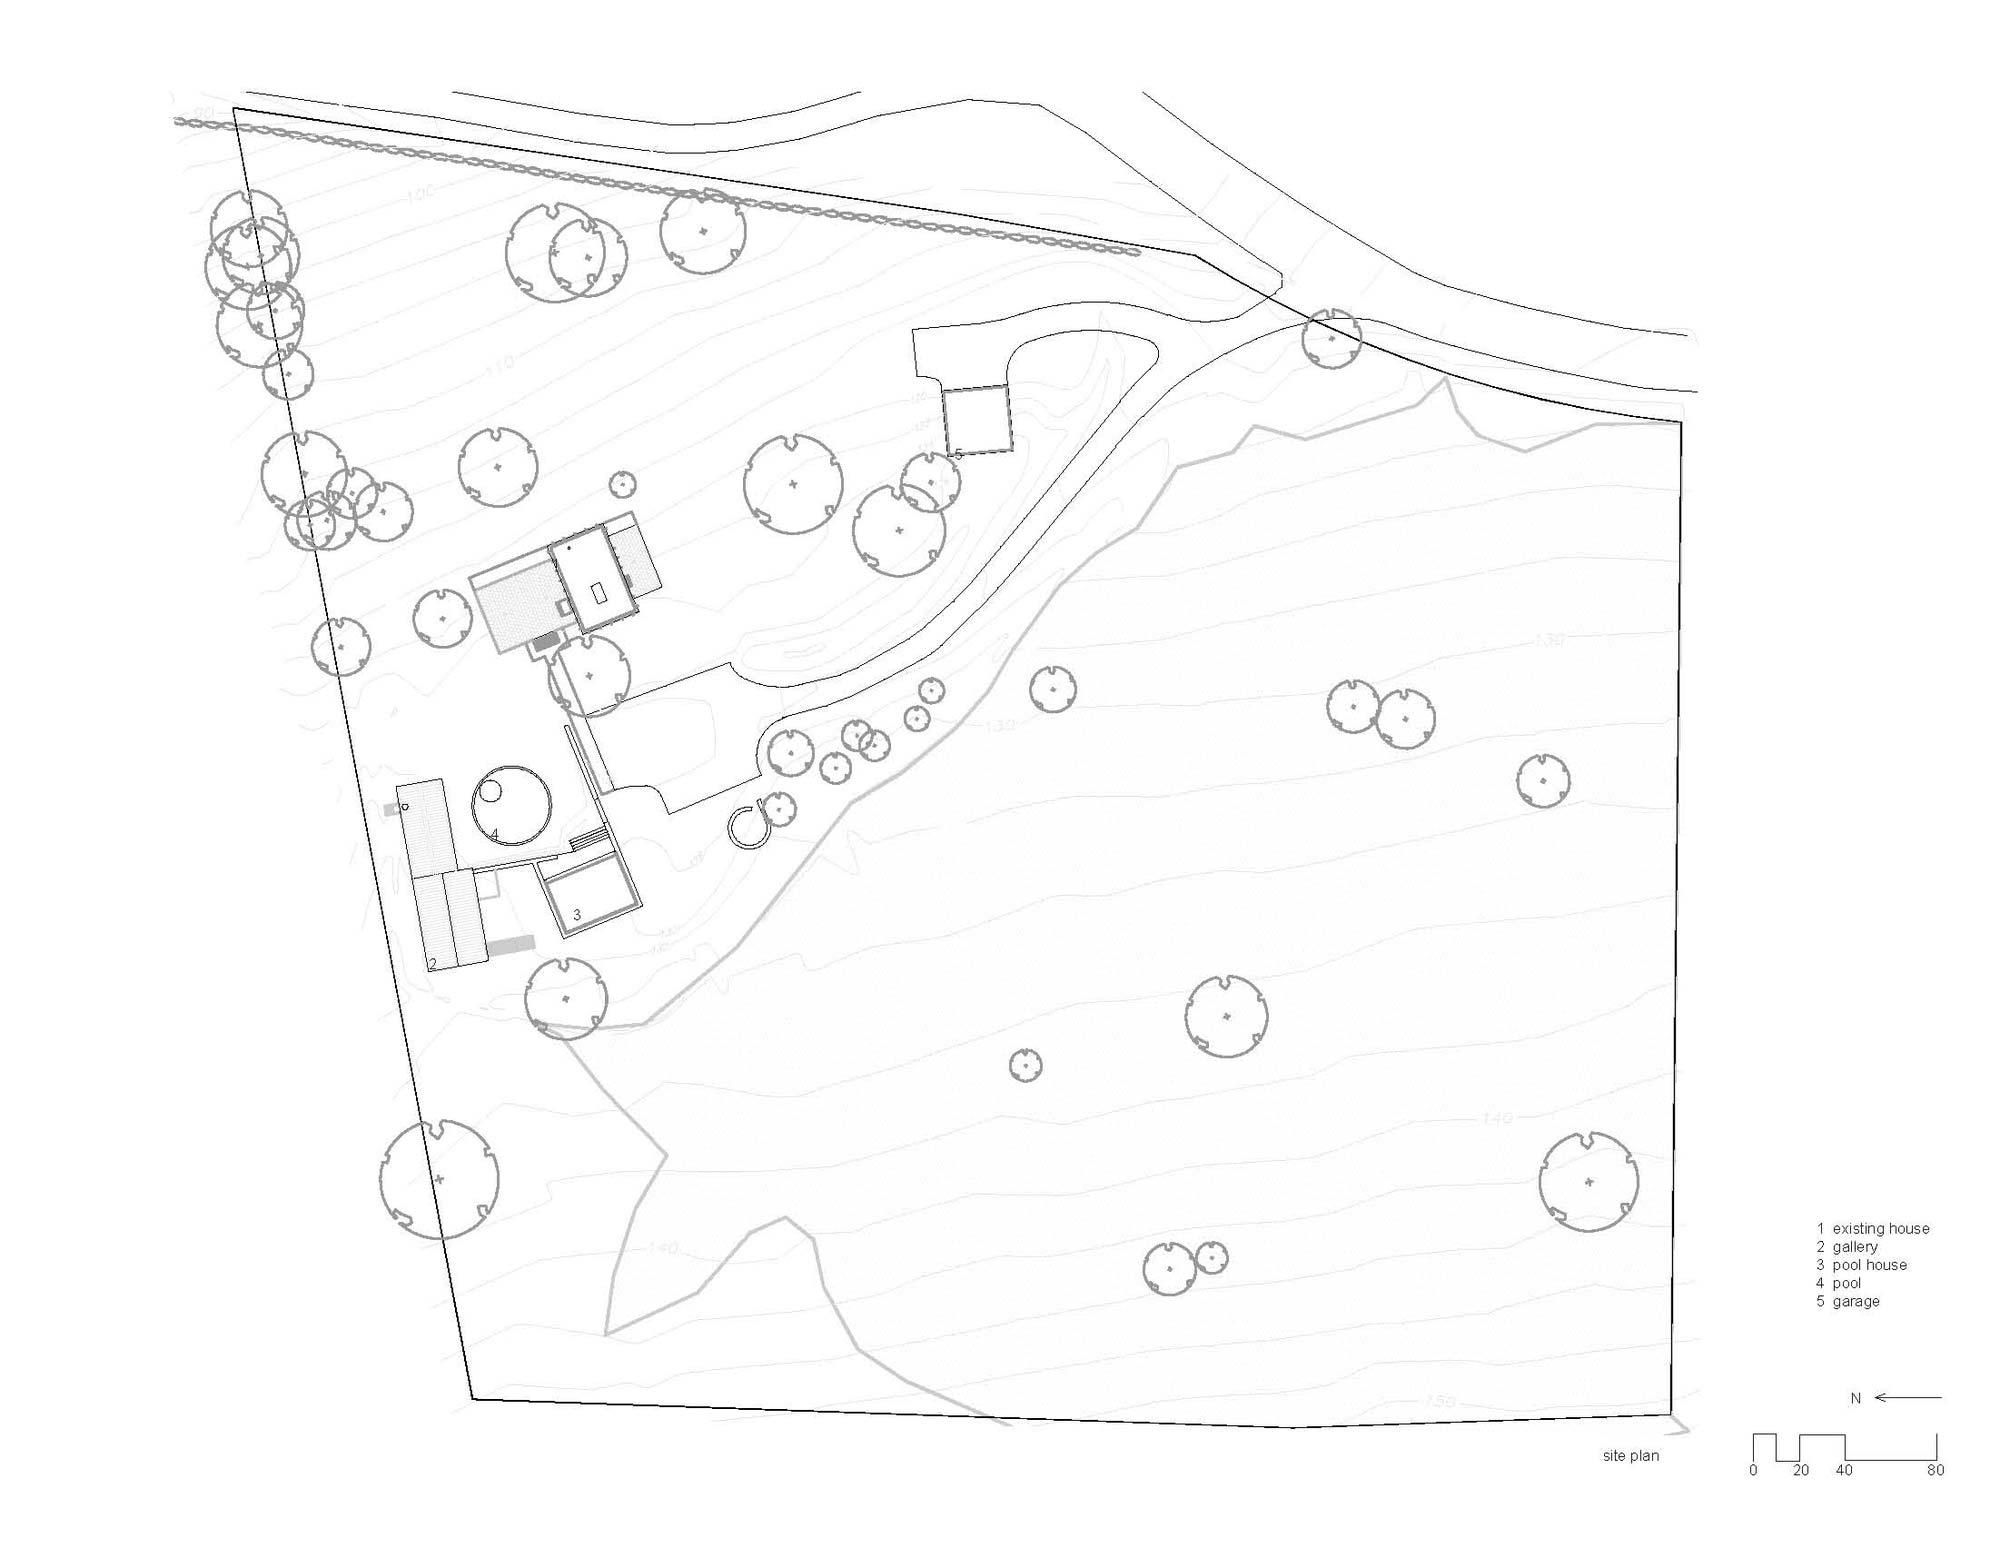 Site Plan, Robert C. Wiley House Originally Designed by